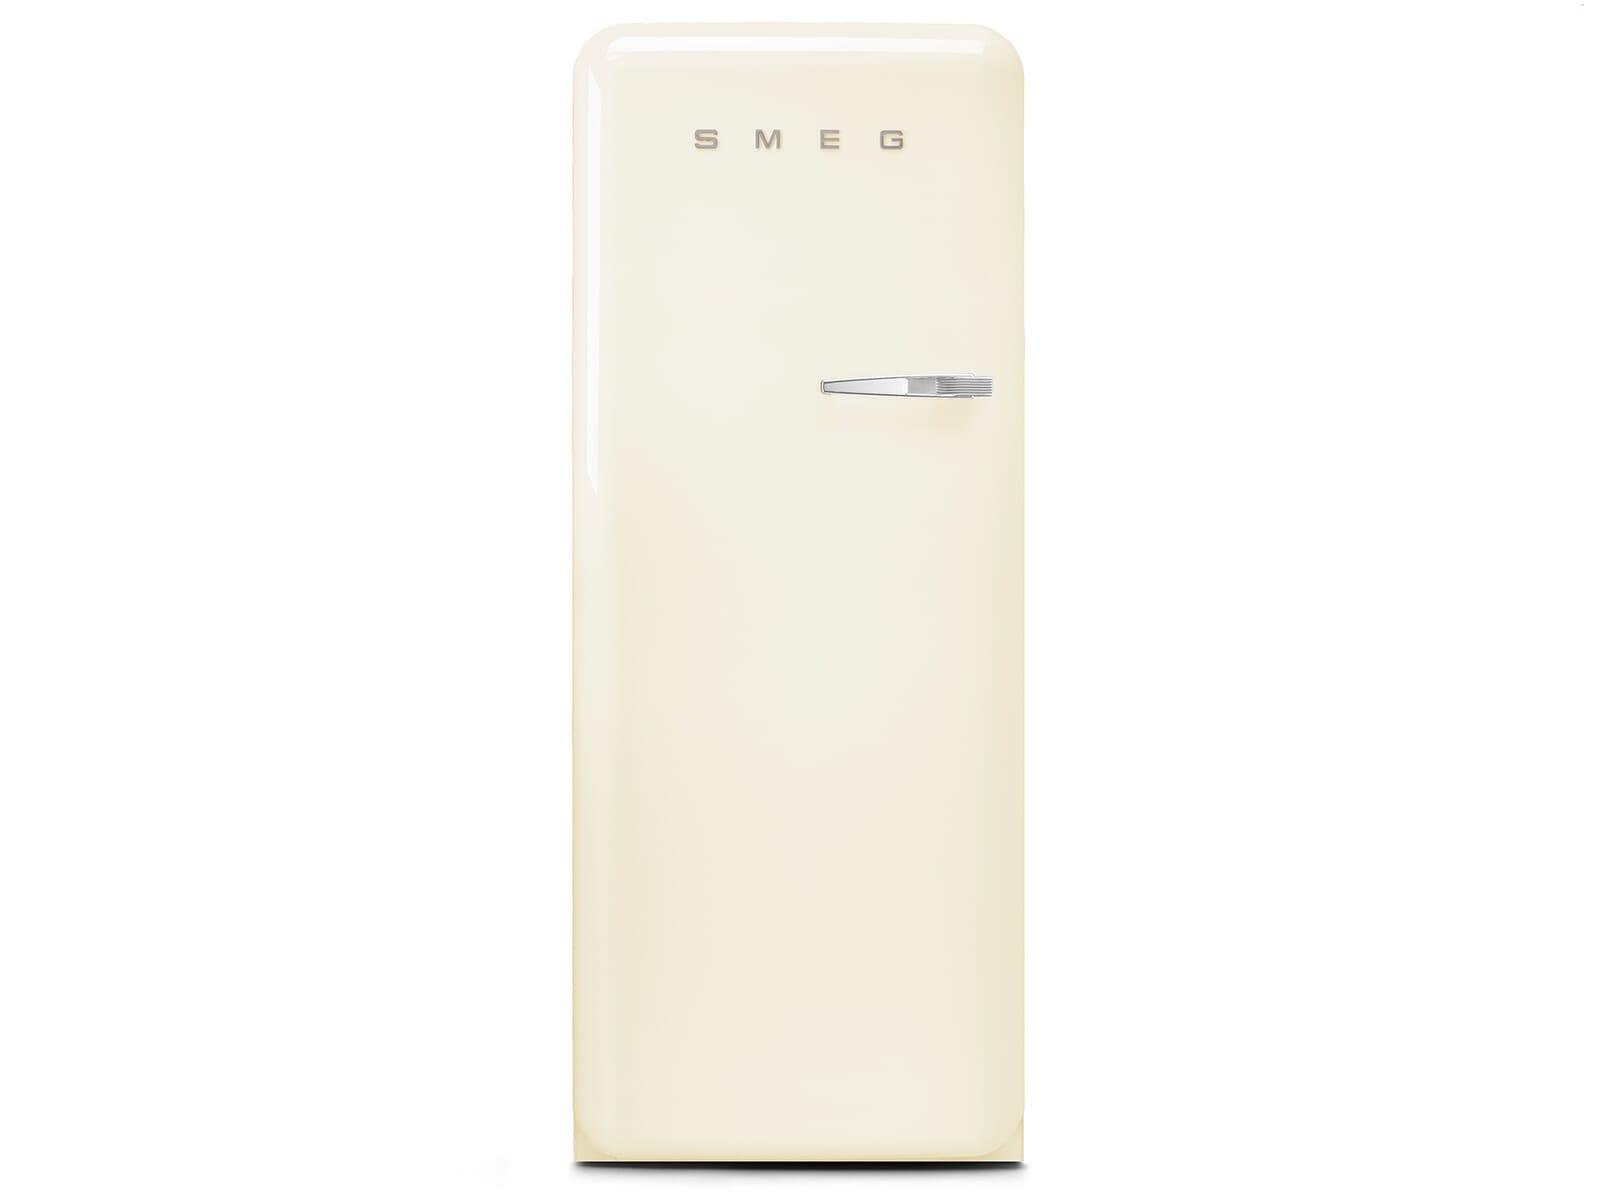 Smeg Kühlschrank Beige : Smeg kaffeemaschine creme: smeg kaffeemaschine ebay kleinanzeigen